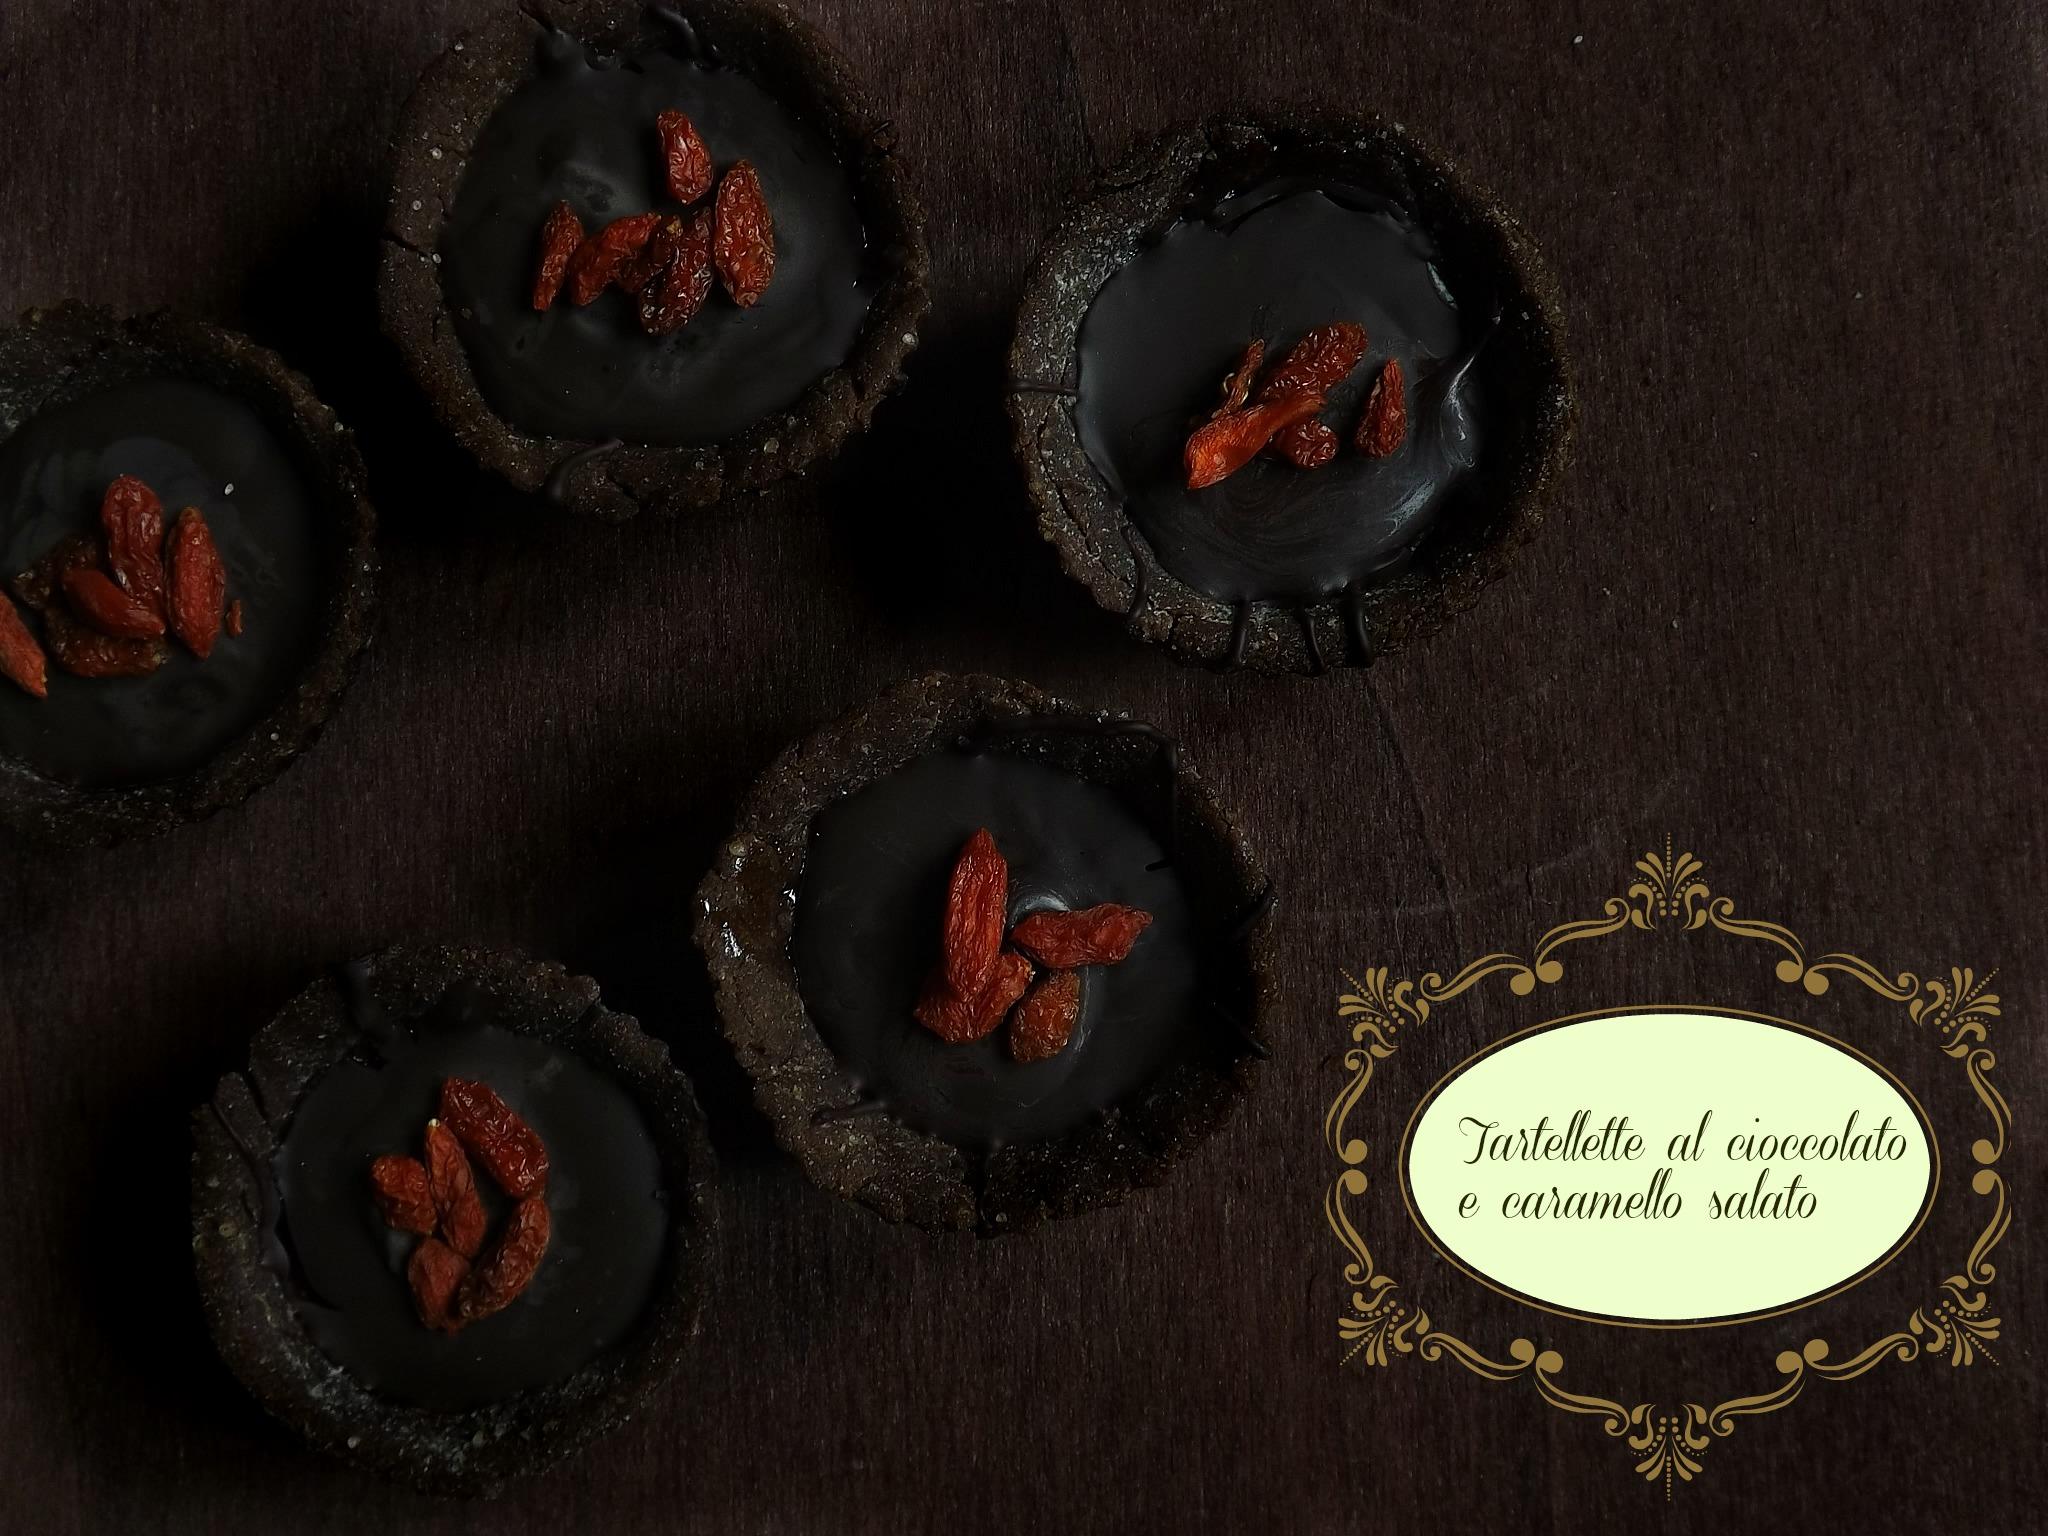 Chocolate and salted caramel gluten free tarts